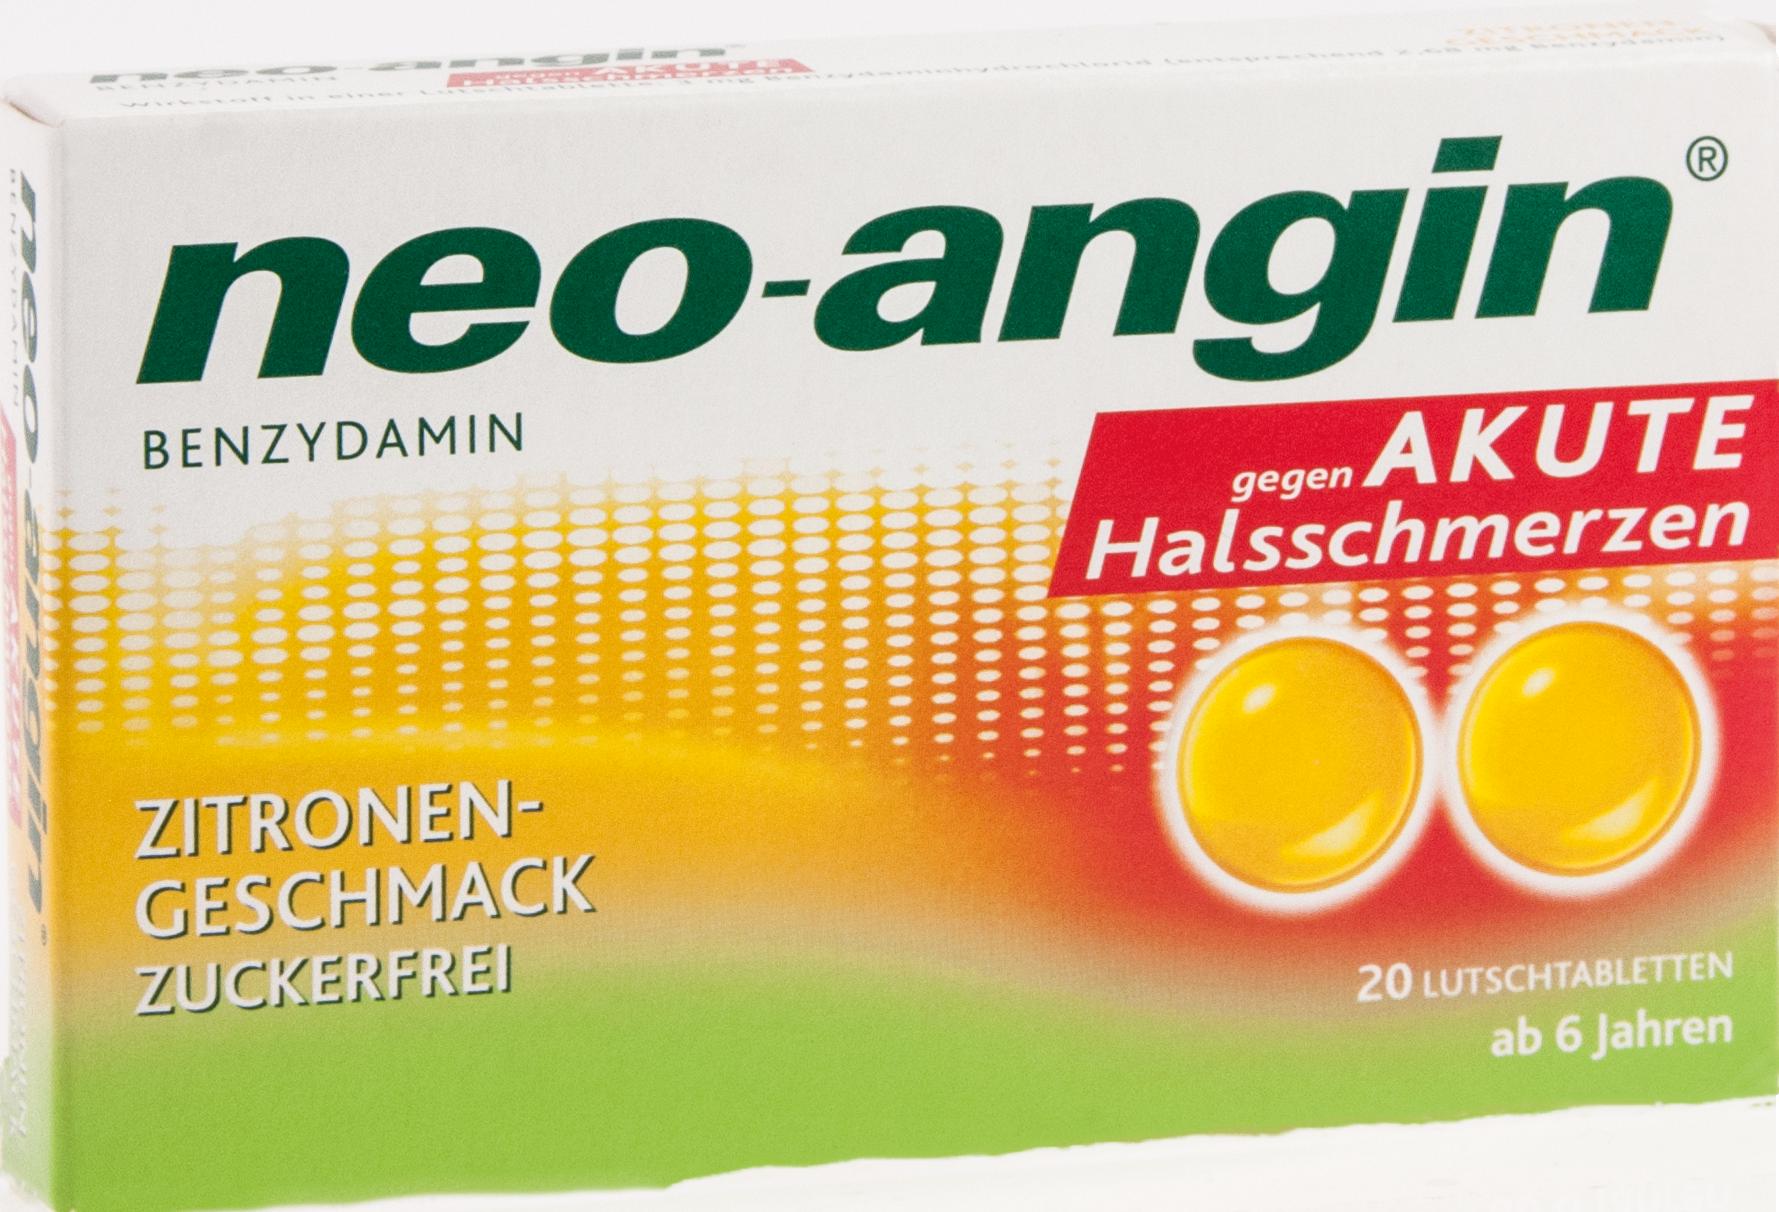 neo-angin Benzydamin akute Halsschmerz Zitrone